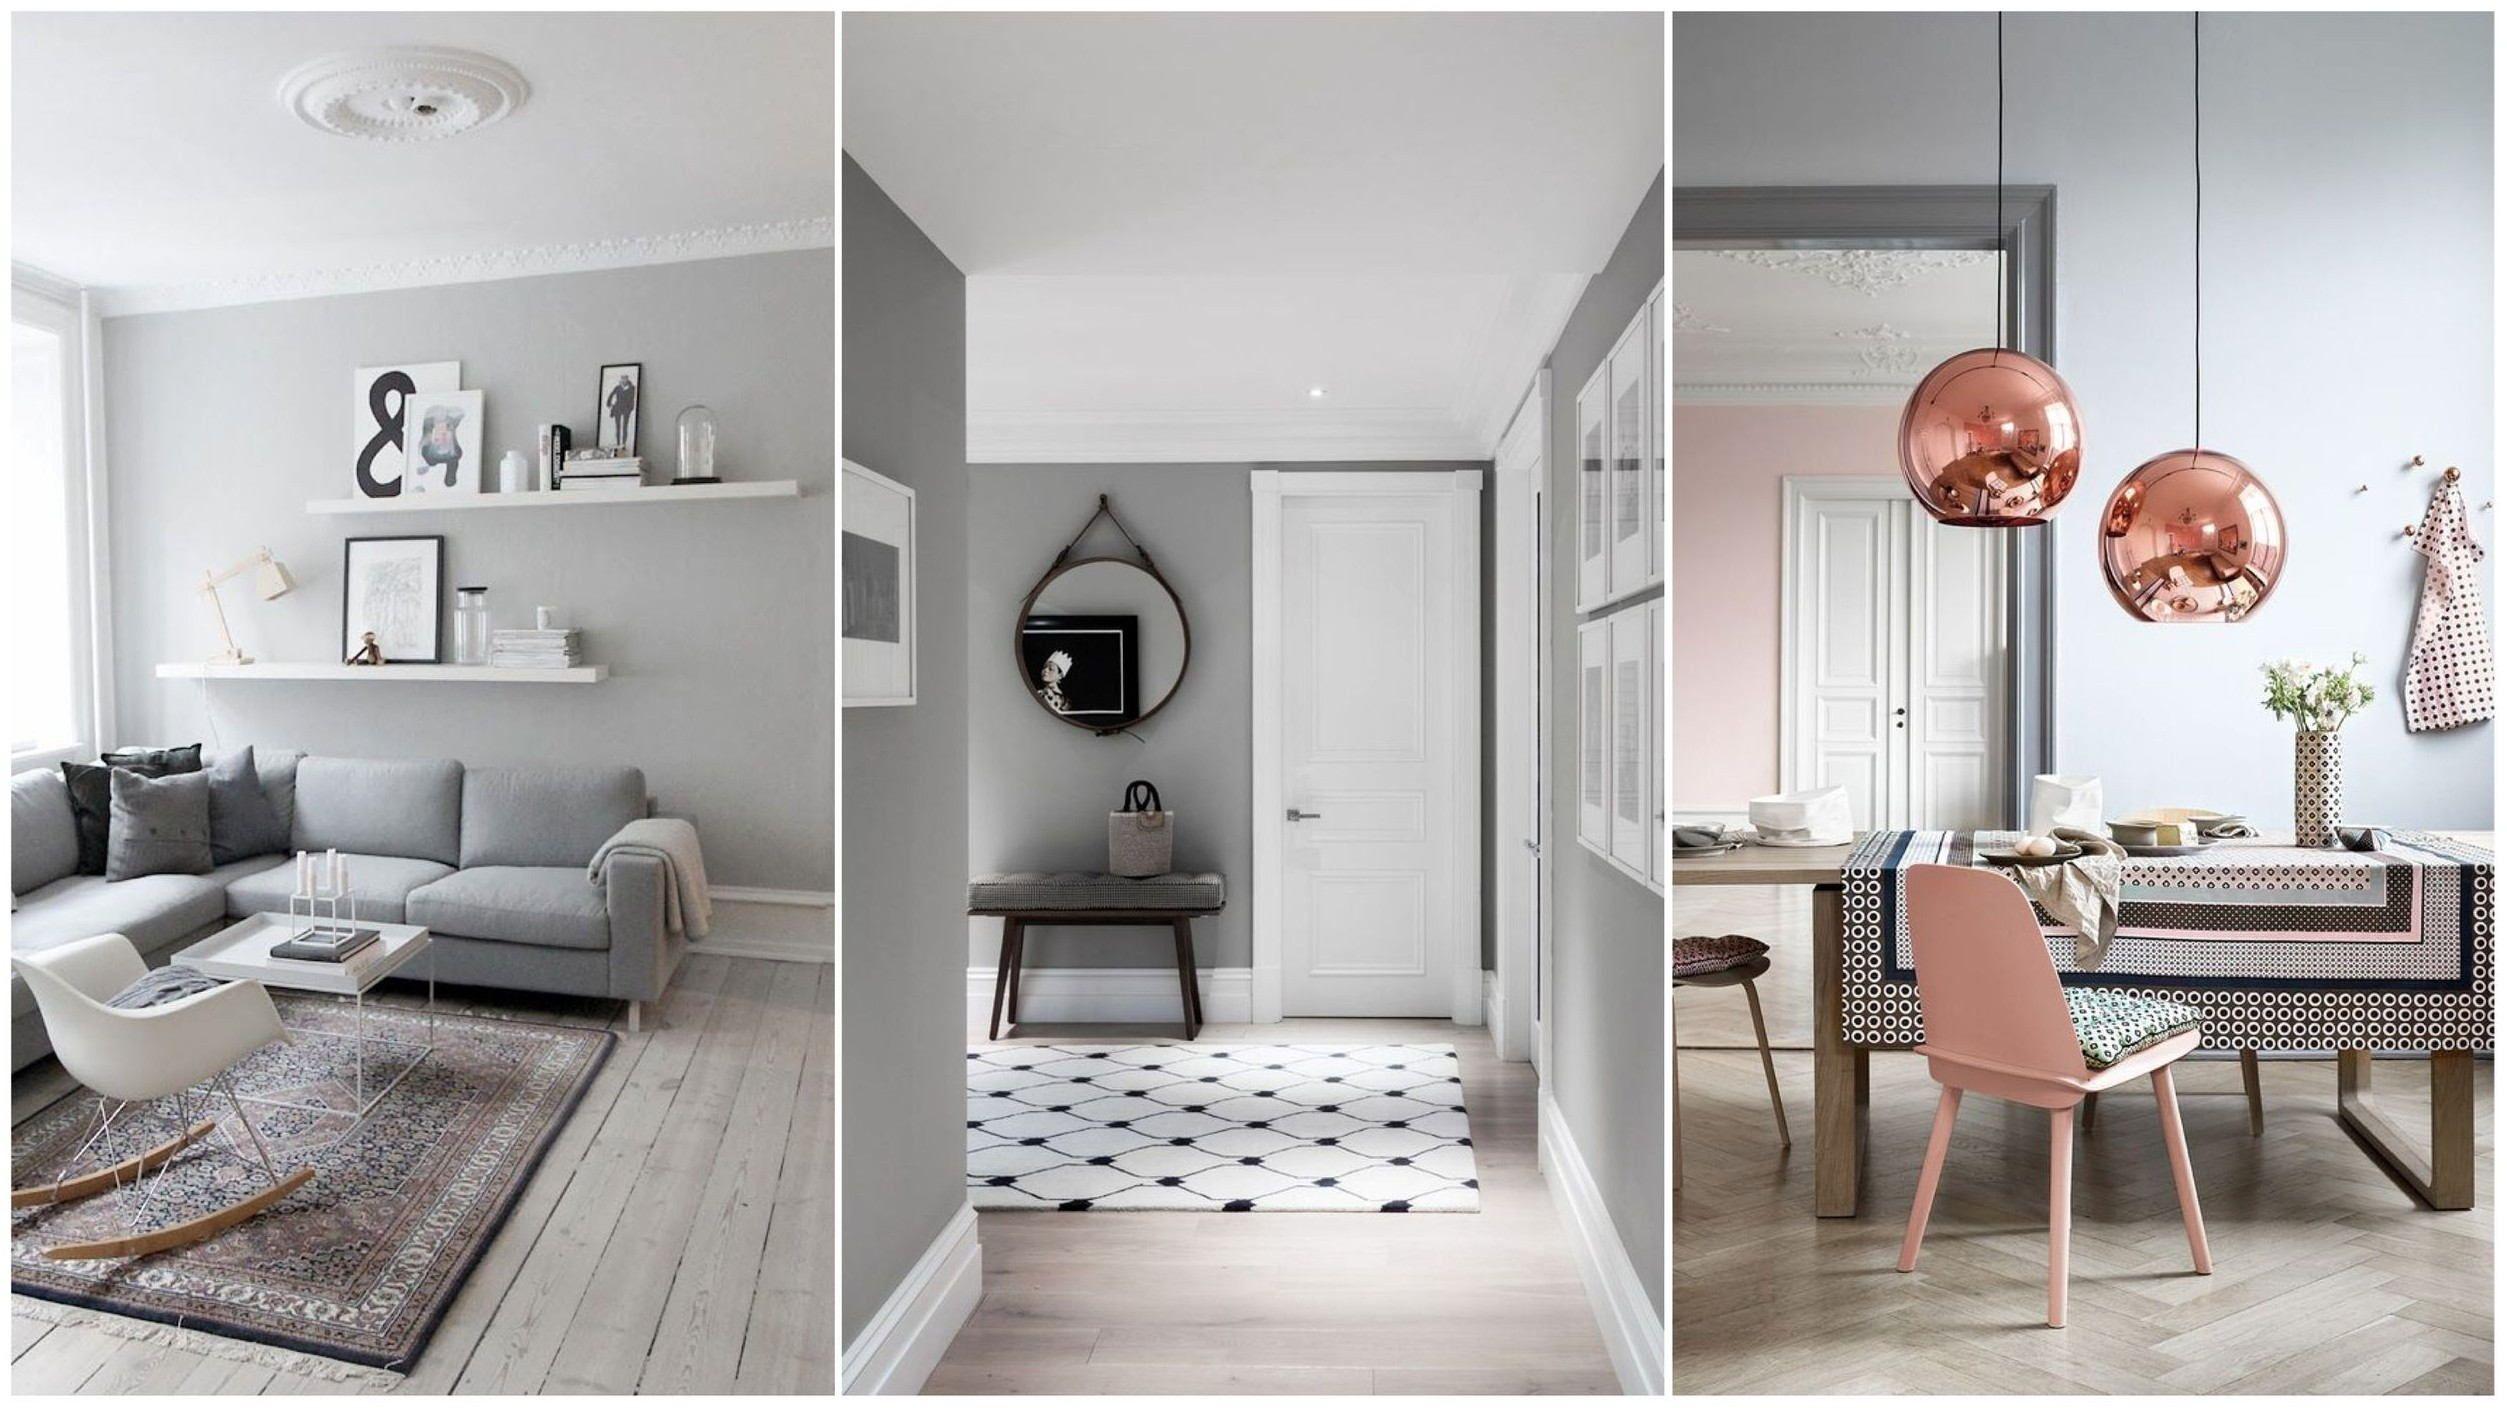 Best Dulux Grey Paint For Living Room Dulux Grey Paint Warm Grey Walls Paint Colors For Living Room